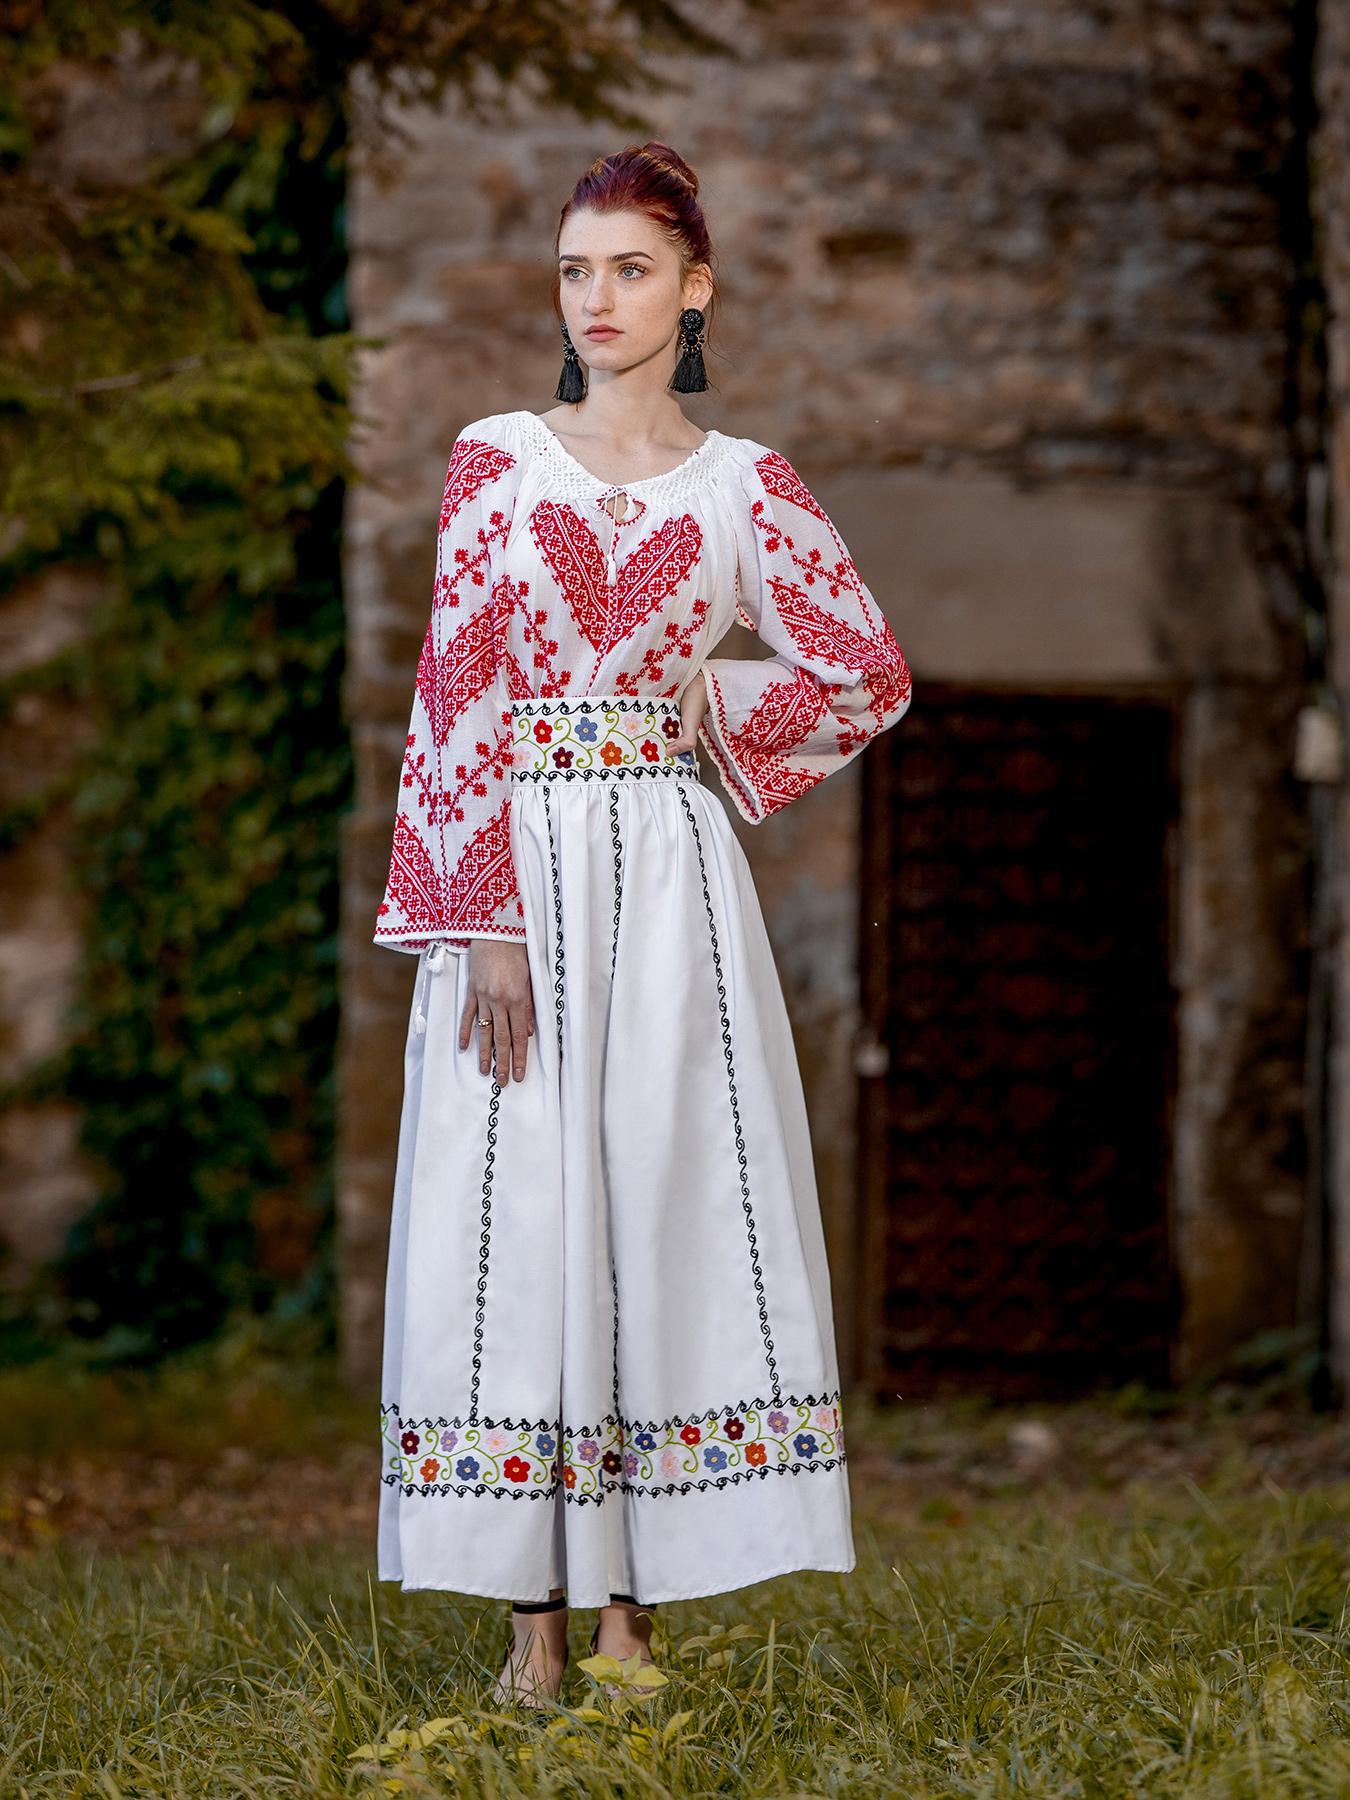 Ie Traditionala Romaneasca Crasna zona Oltenia